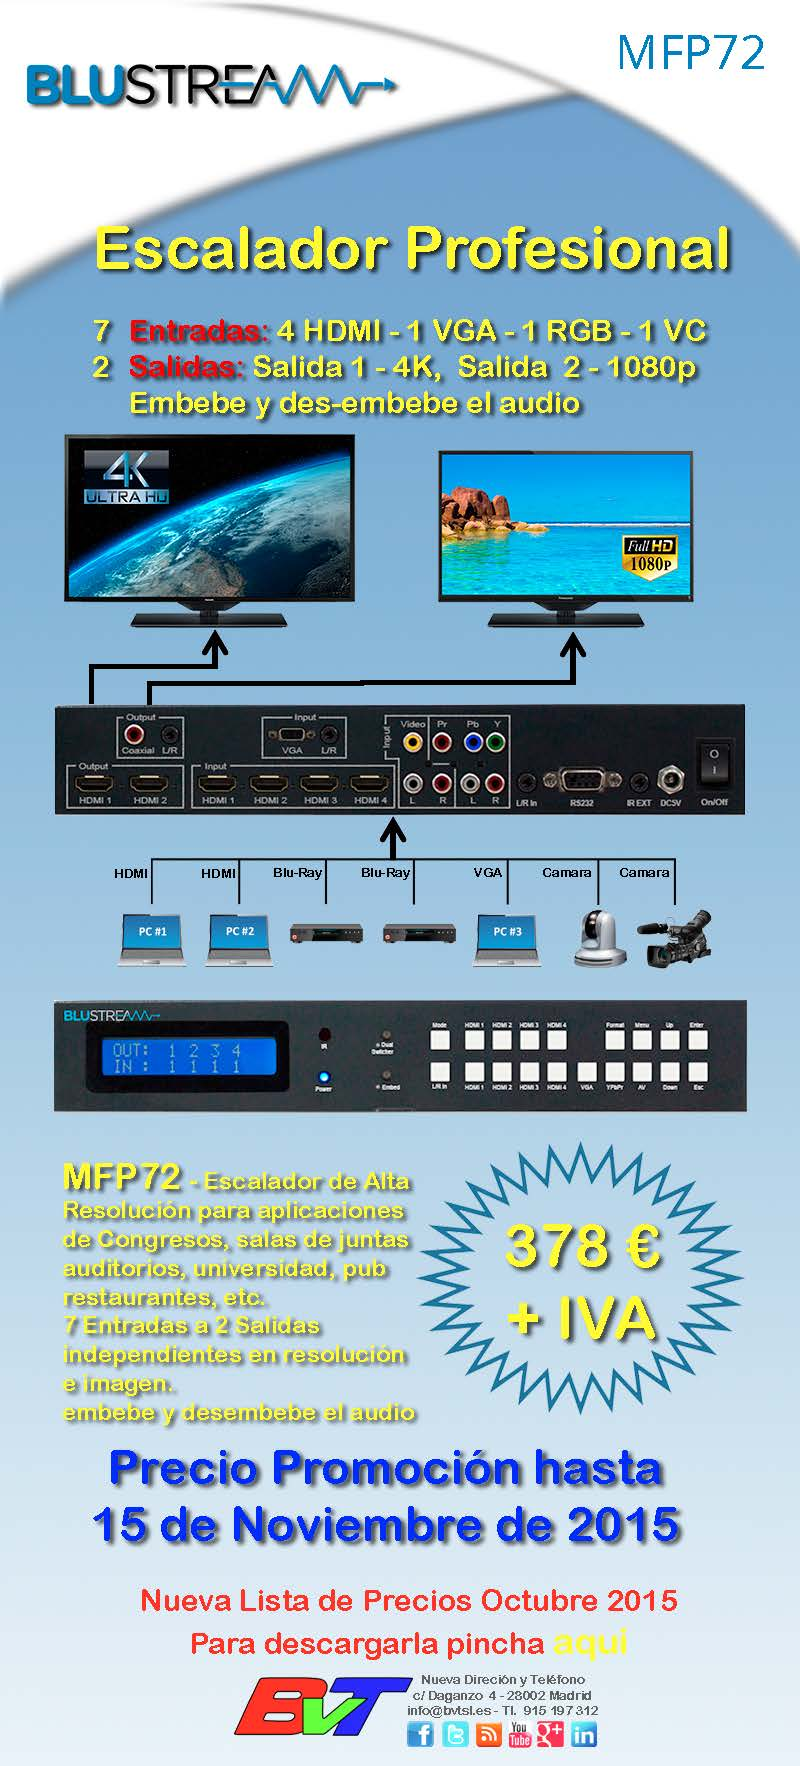 Precio Oferta MFP72 de Blustream